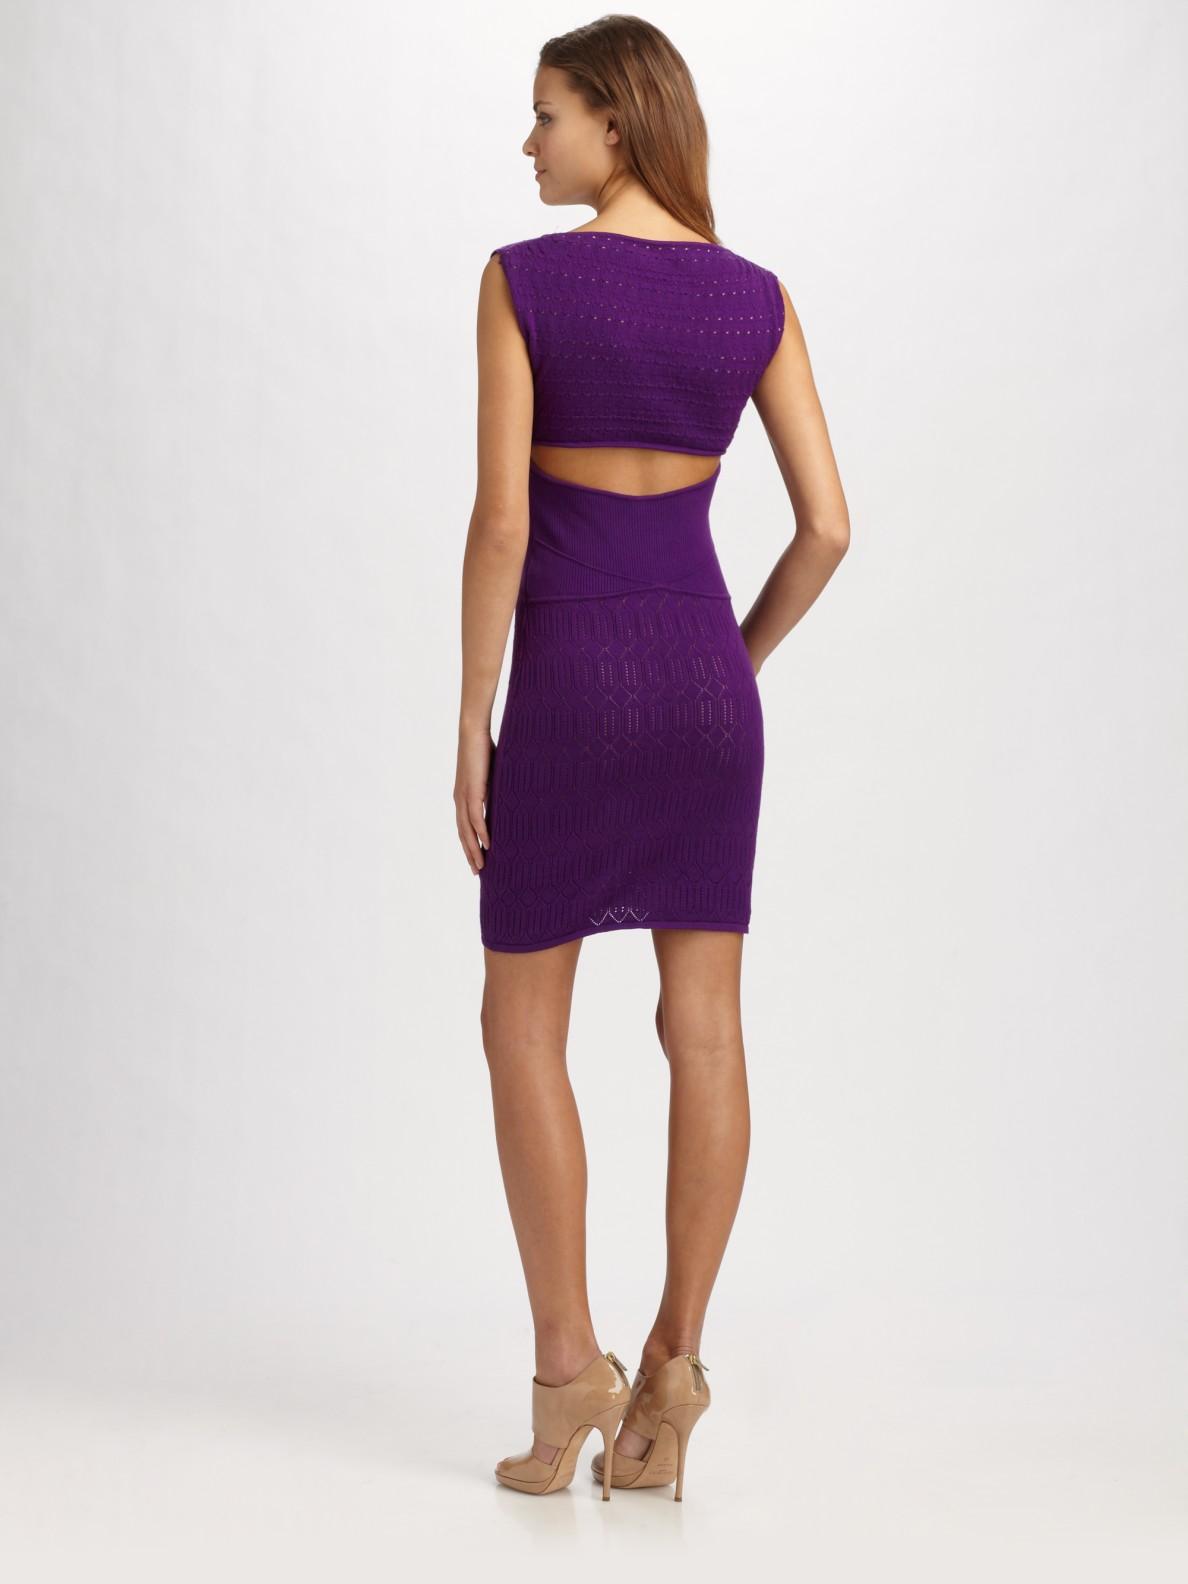 Lyst Catherine Malandrino Knit Cutout Dress In Purple